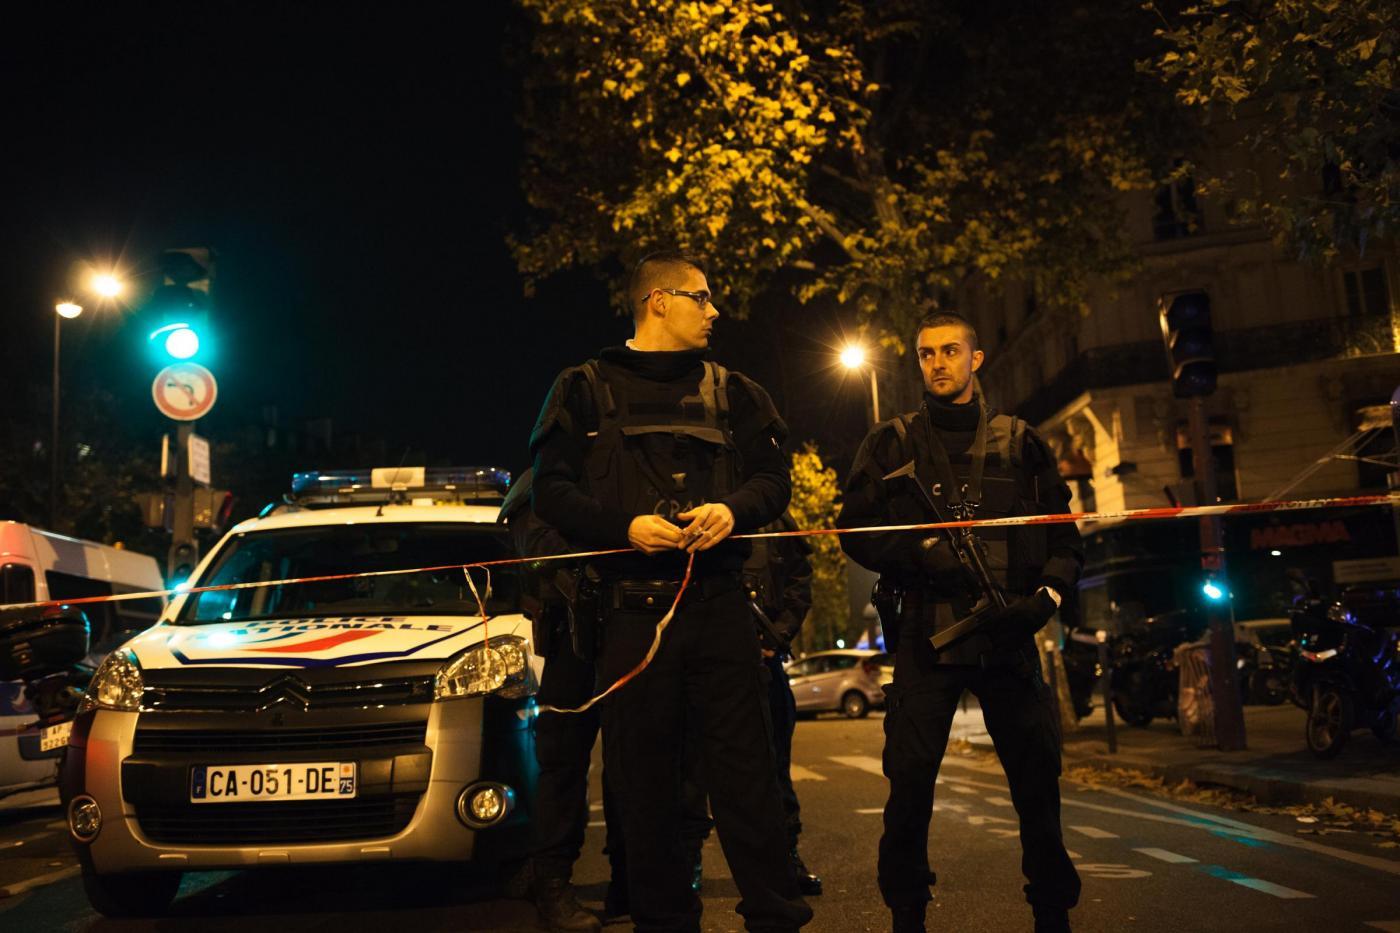 Attentati a Parigi: le reazioni su Twitter